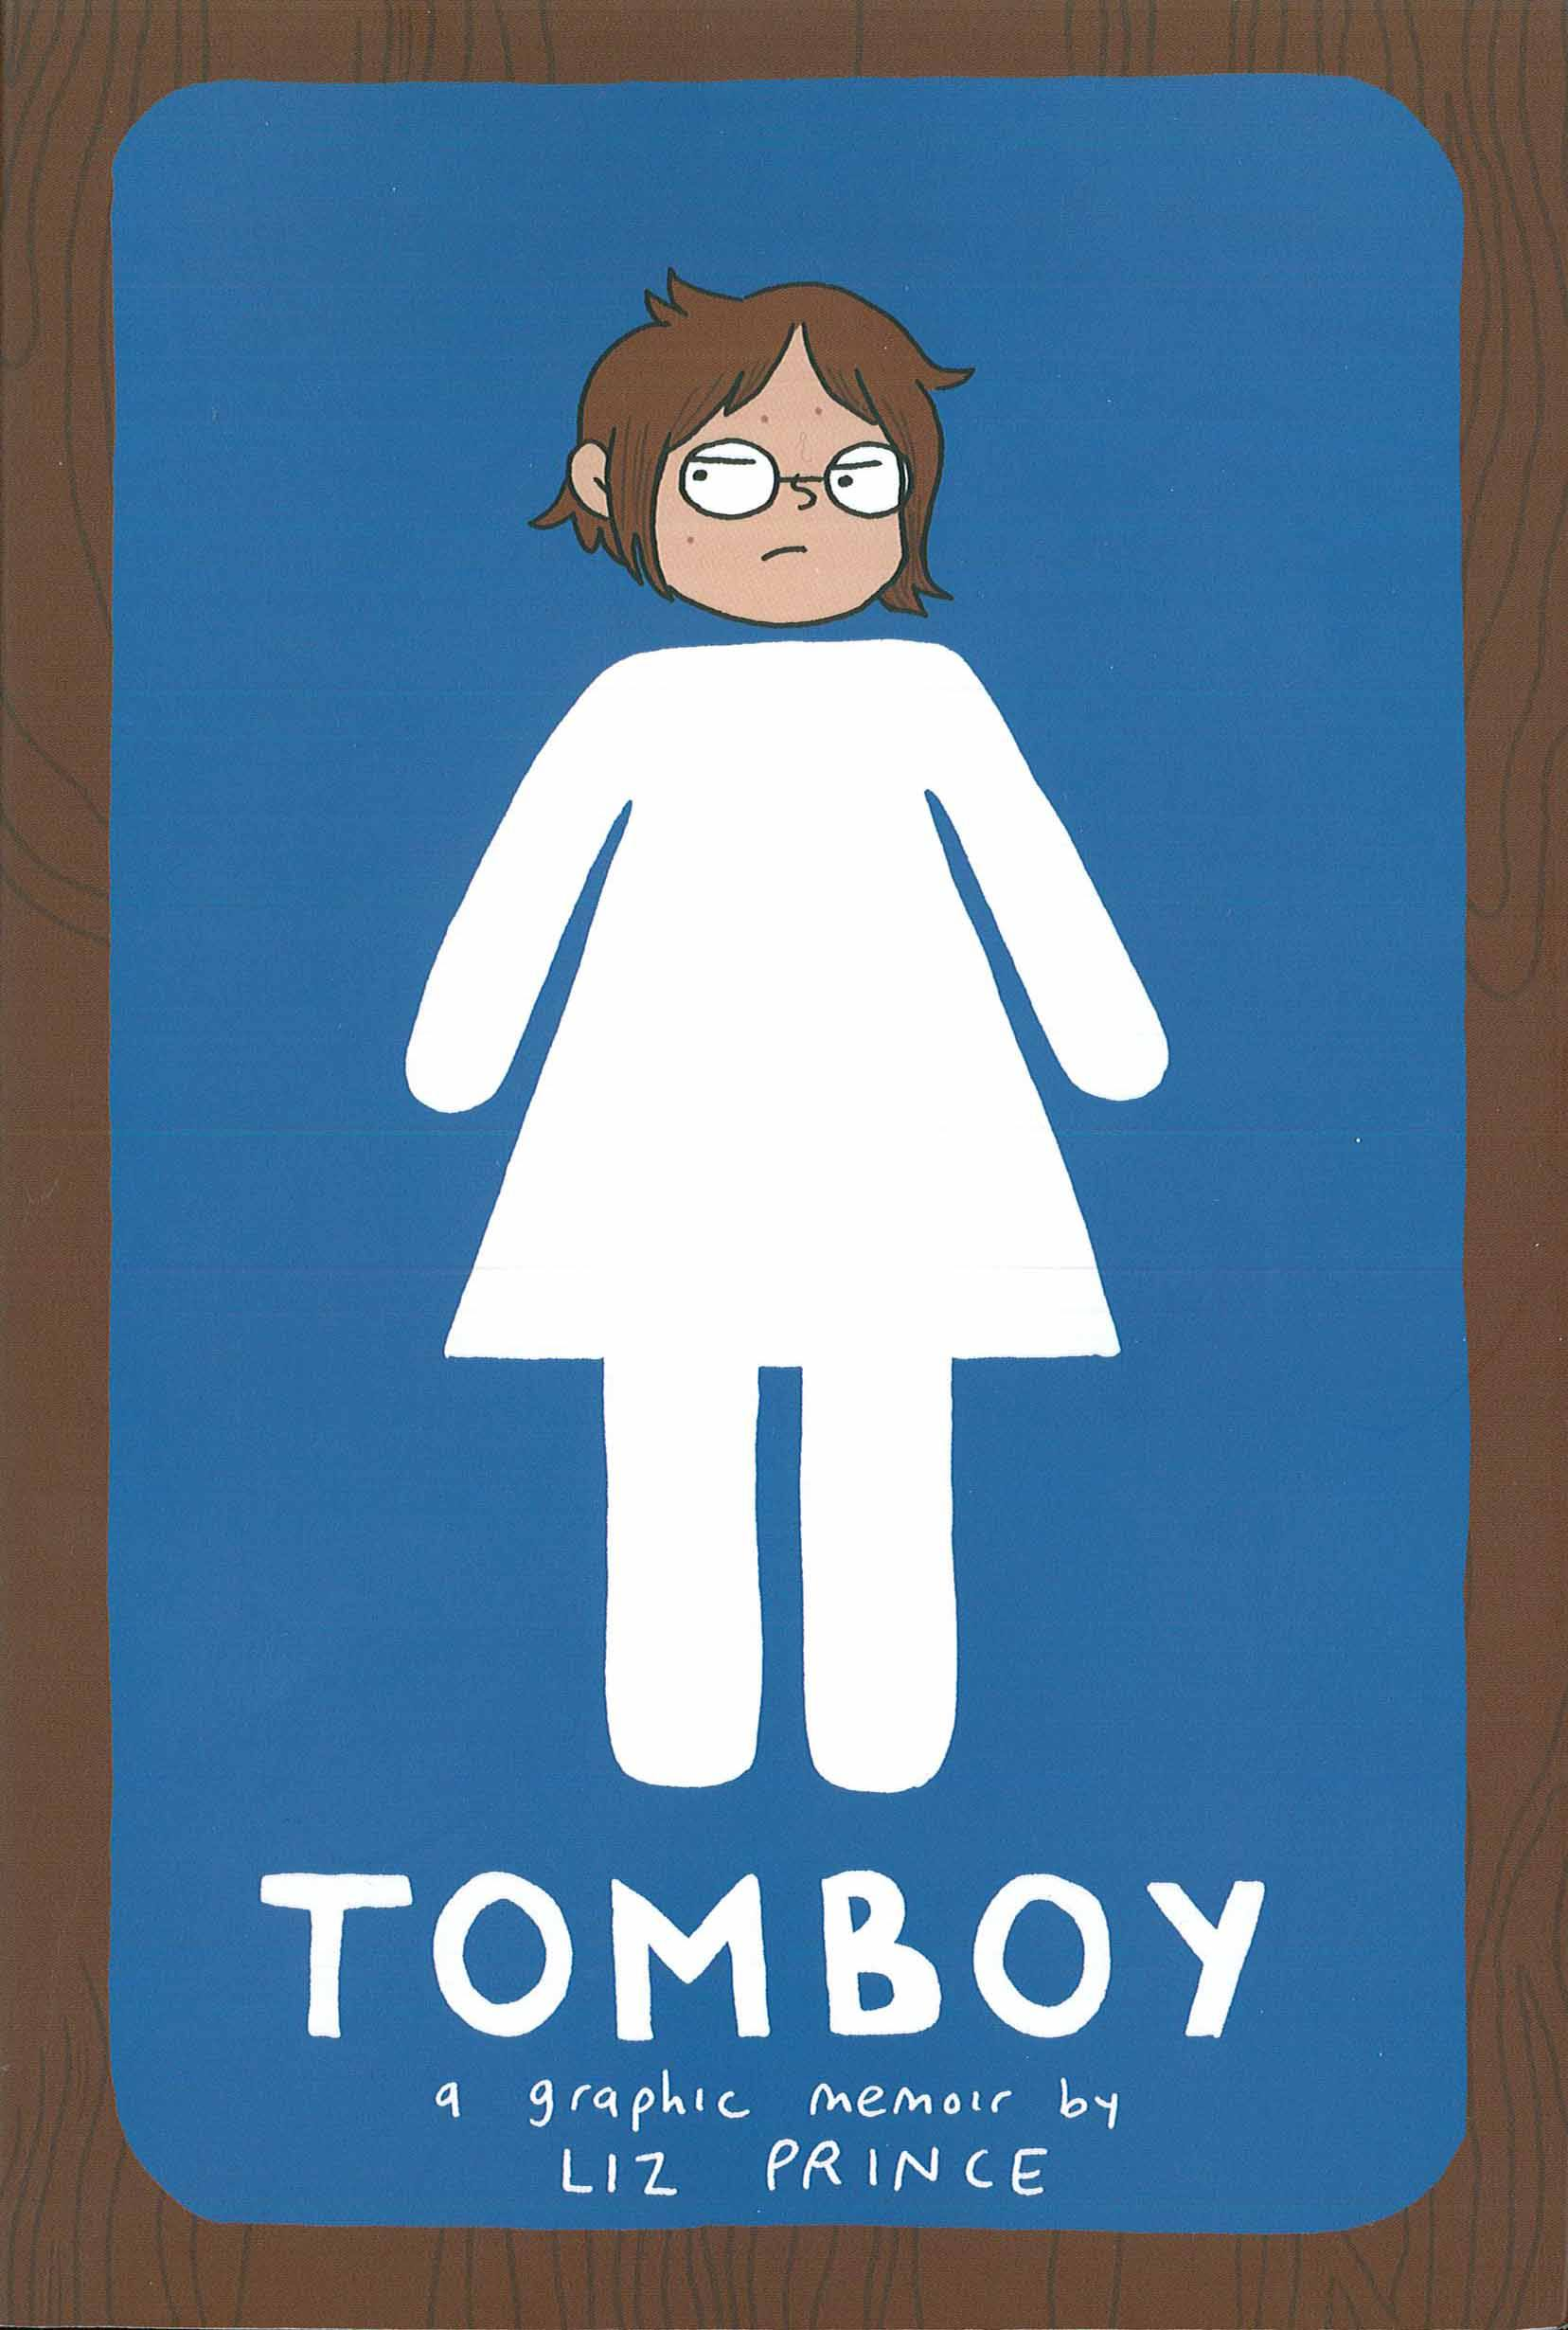 Tomboy Liz Prince